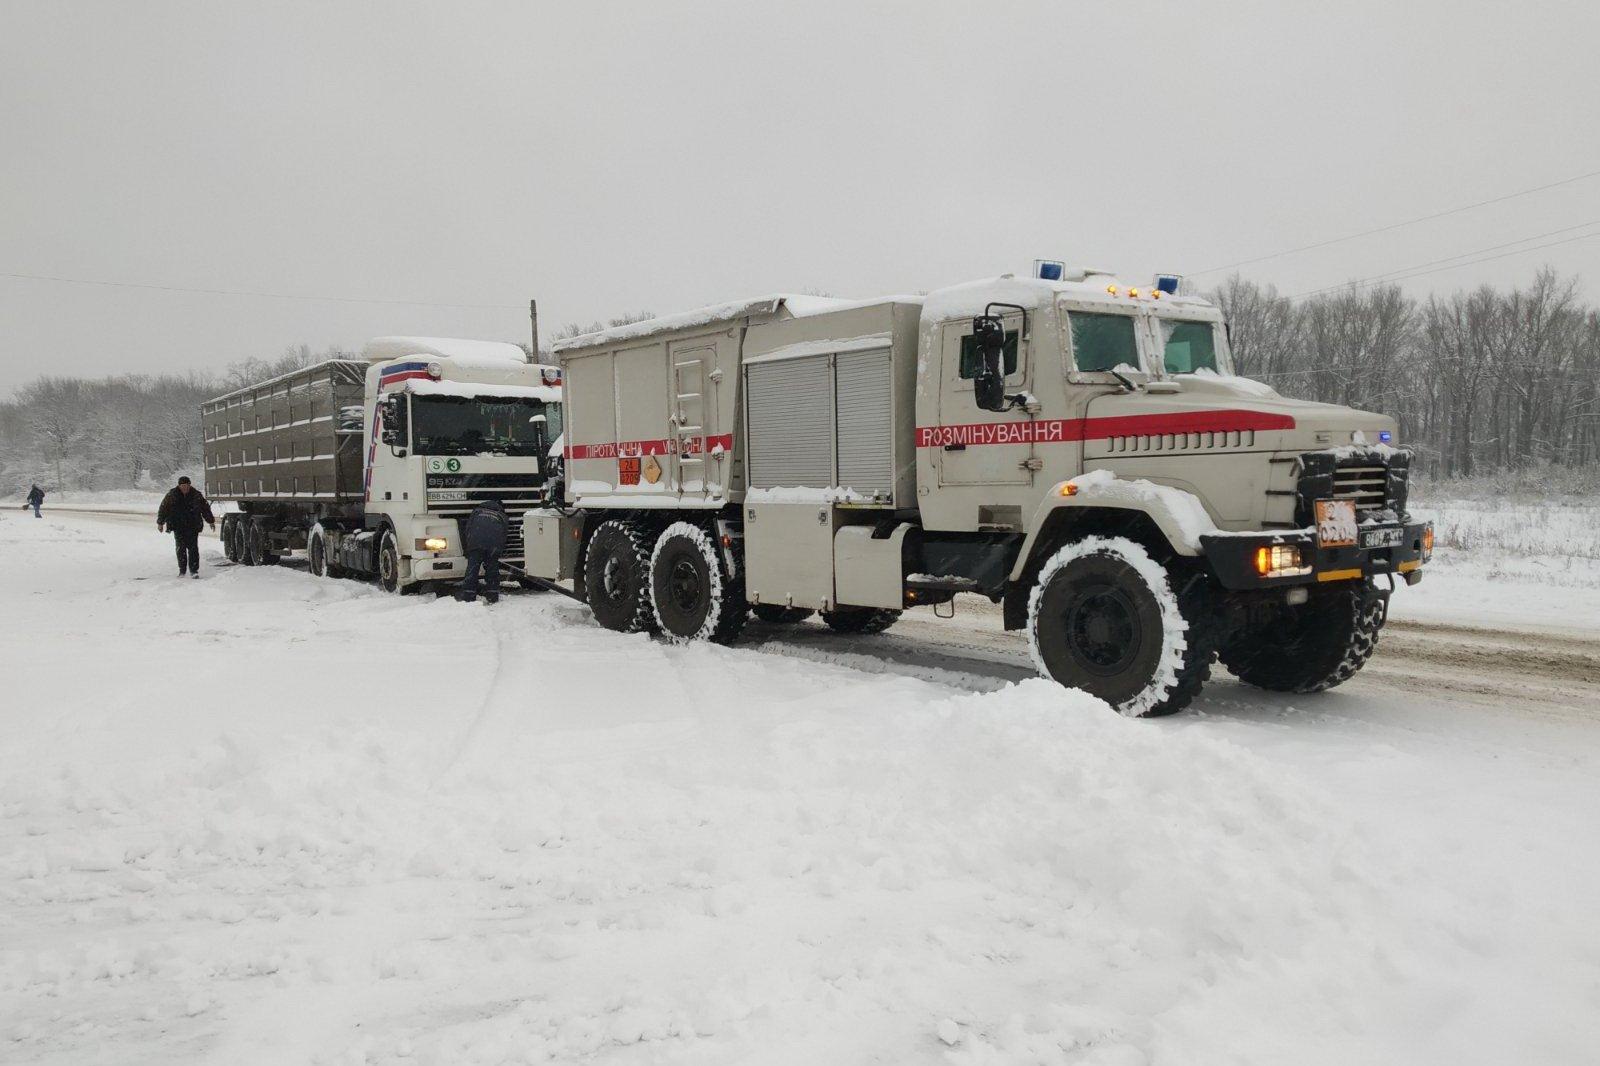 Спасатели на Харьковщине помогли водителям грузовиков (фото)